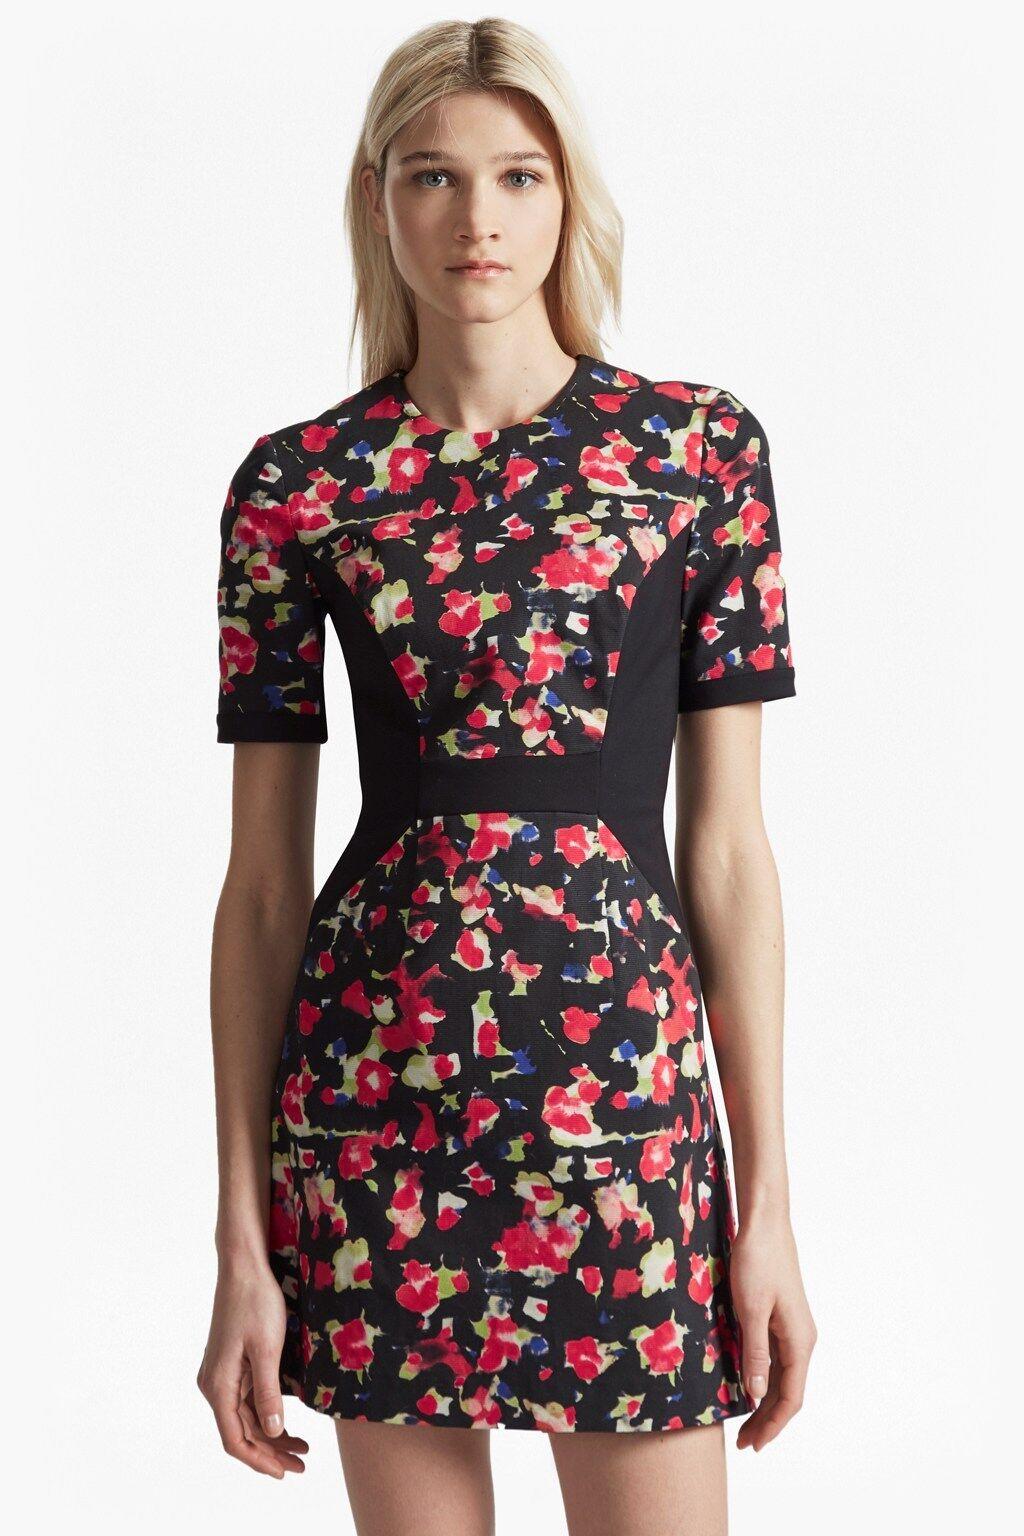 New French Connection Bella Ottoman schwarz rot Floral Mini Dress Sz UK 10